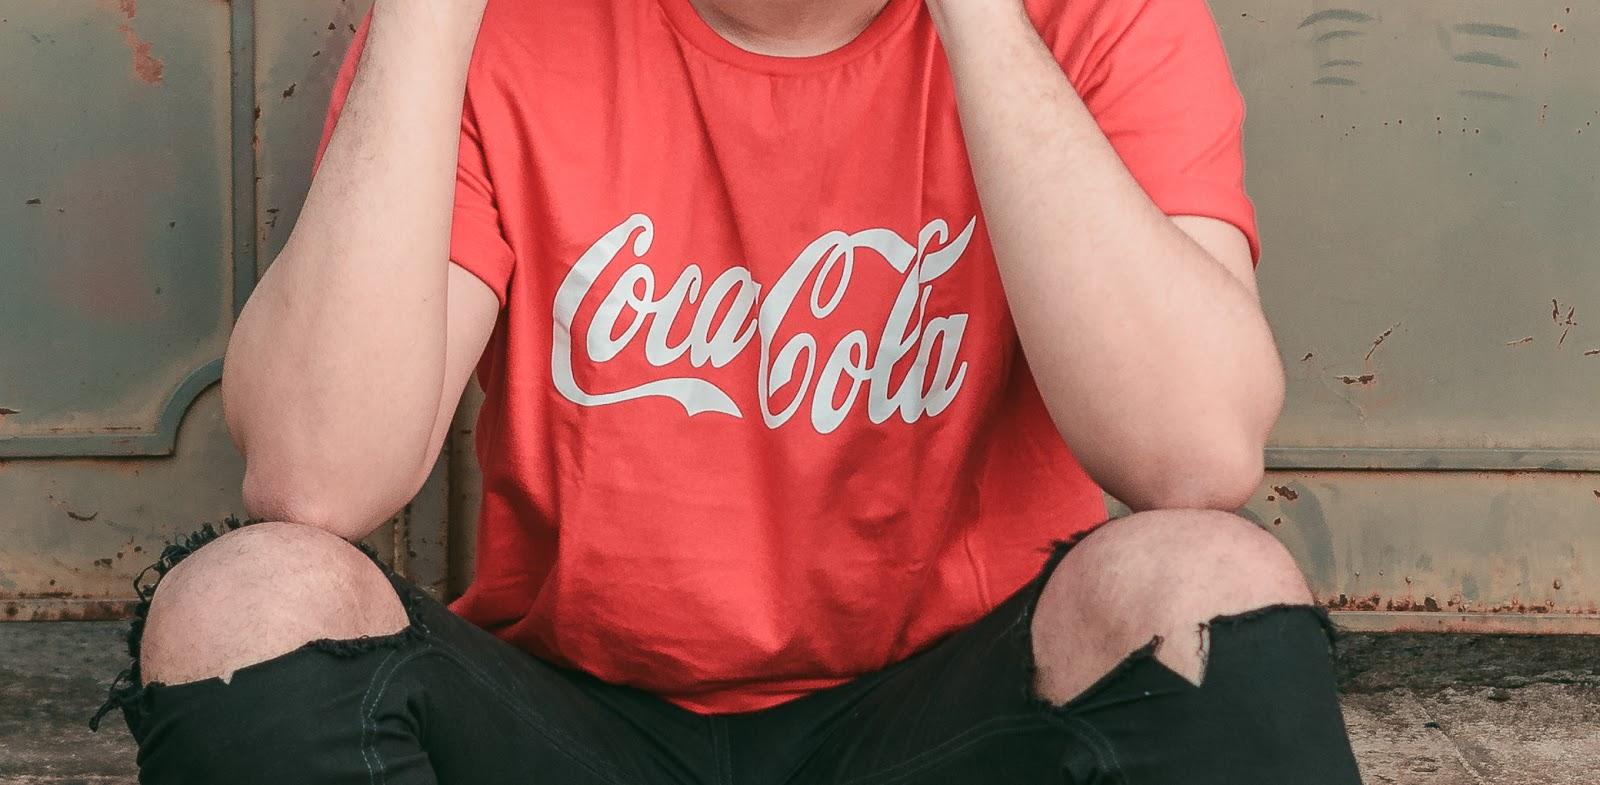 look masculino com camisa vermelha